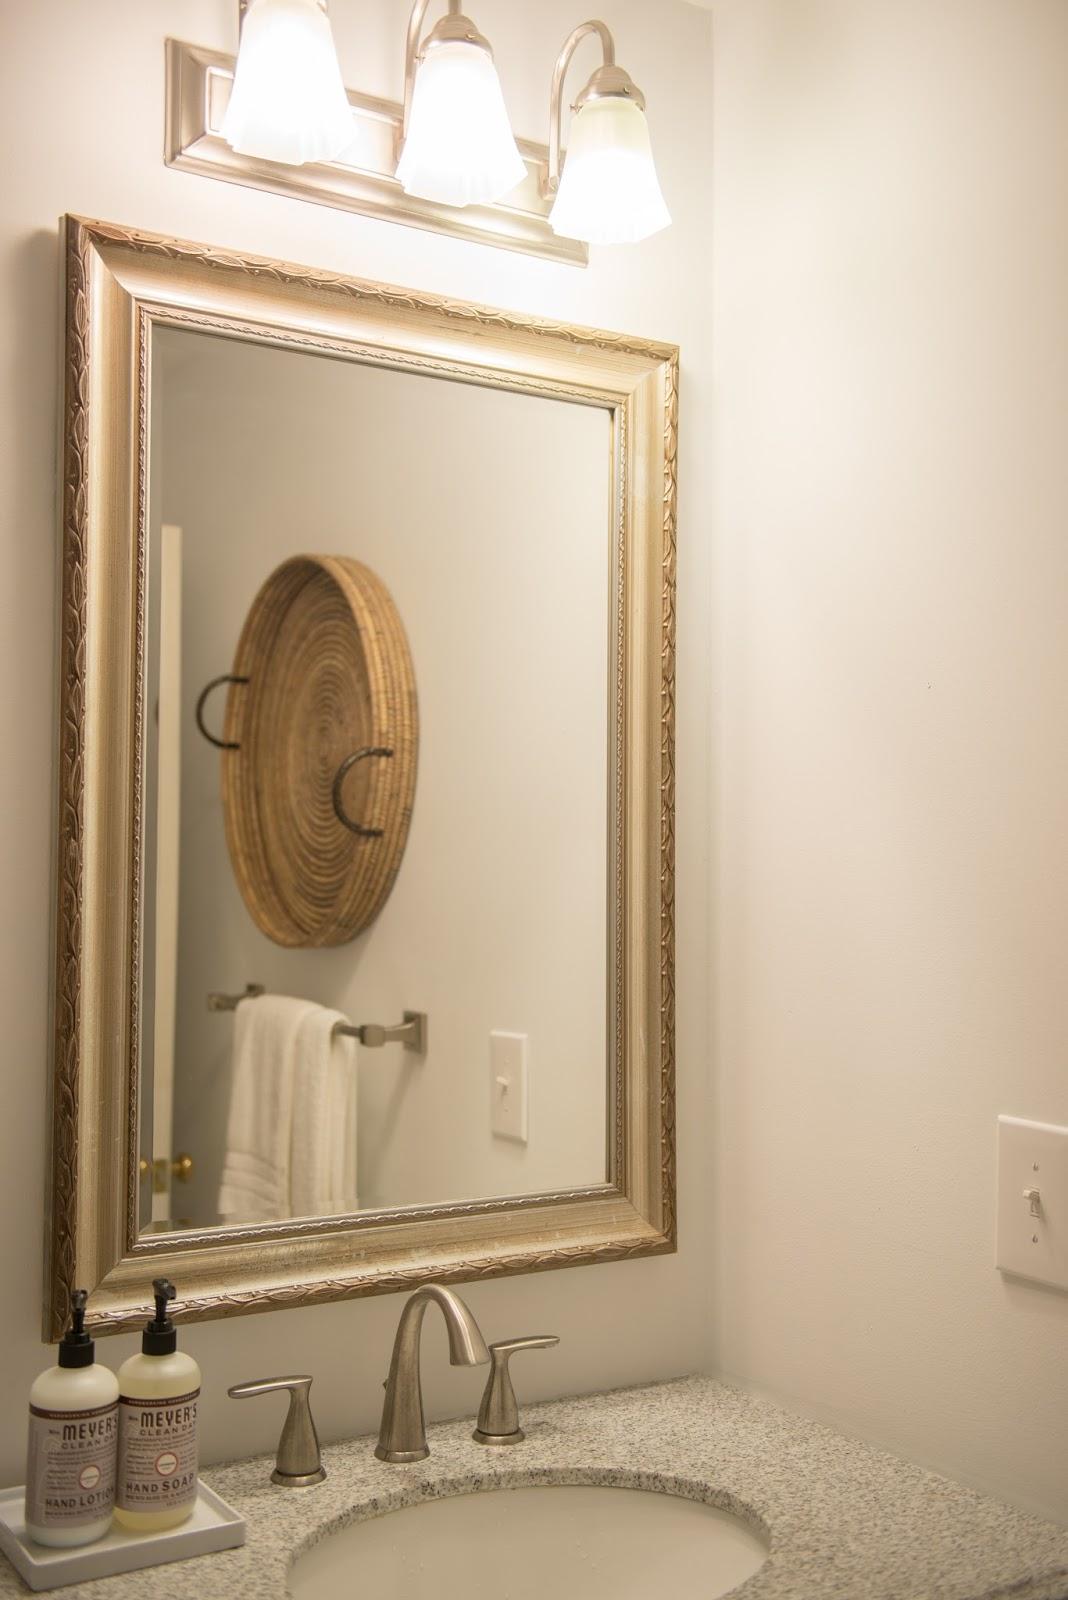 Used bathroom fixtures